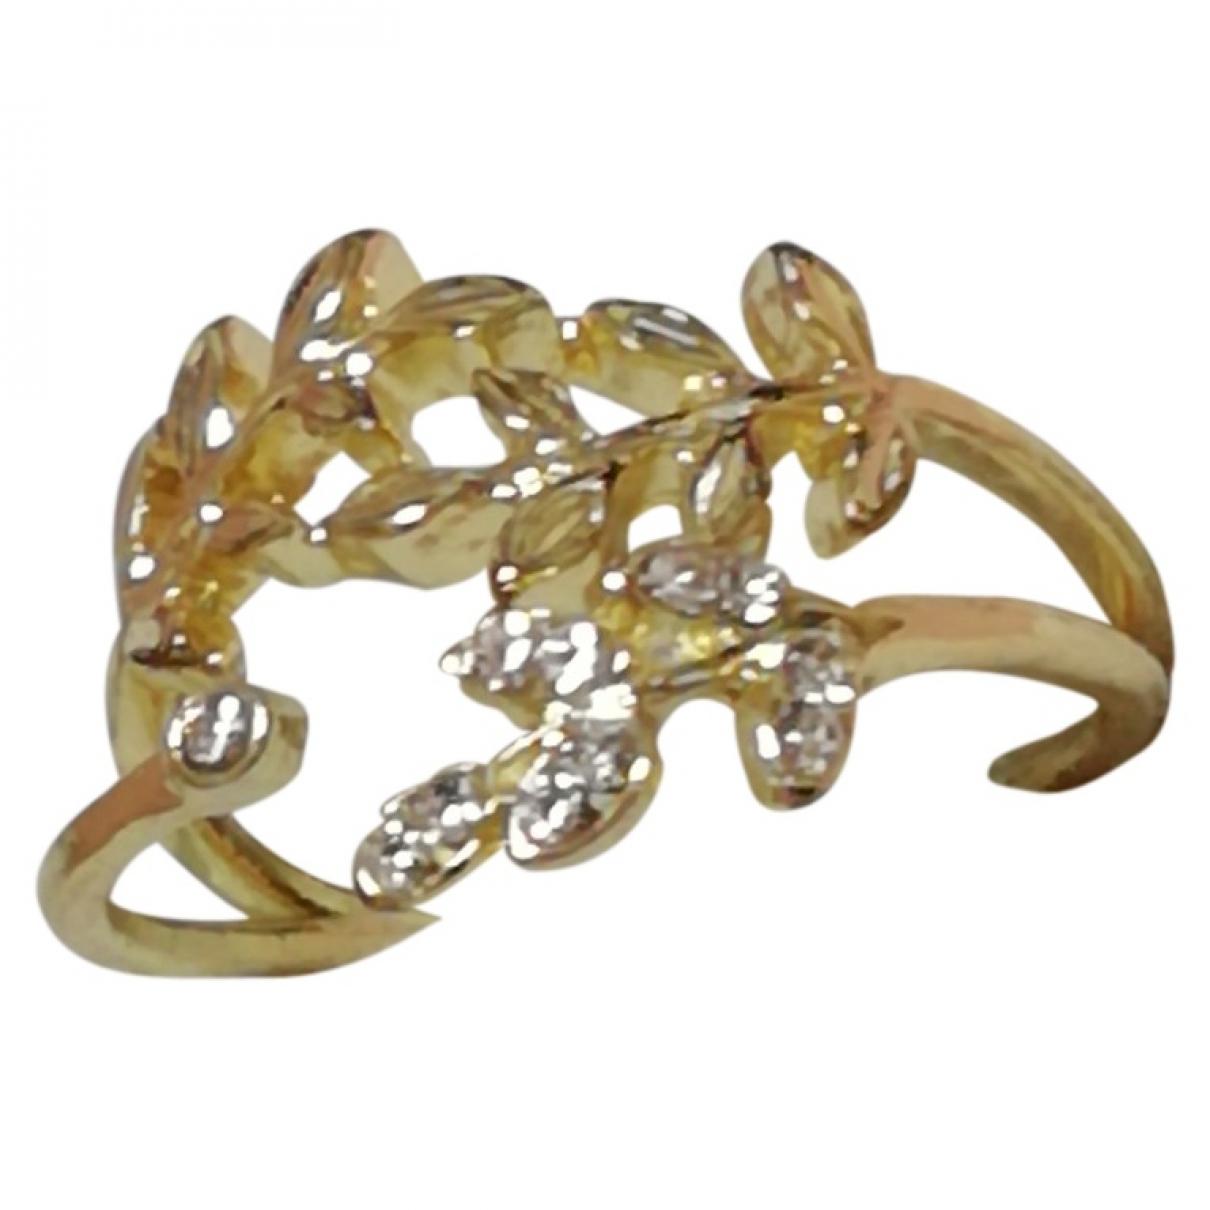 Non Signe / Unsigned Motifs Floraux Schmuck-set in  Gold Metall